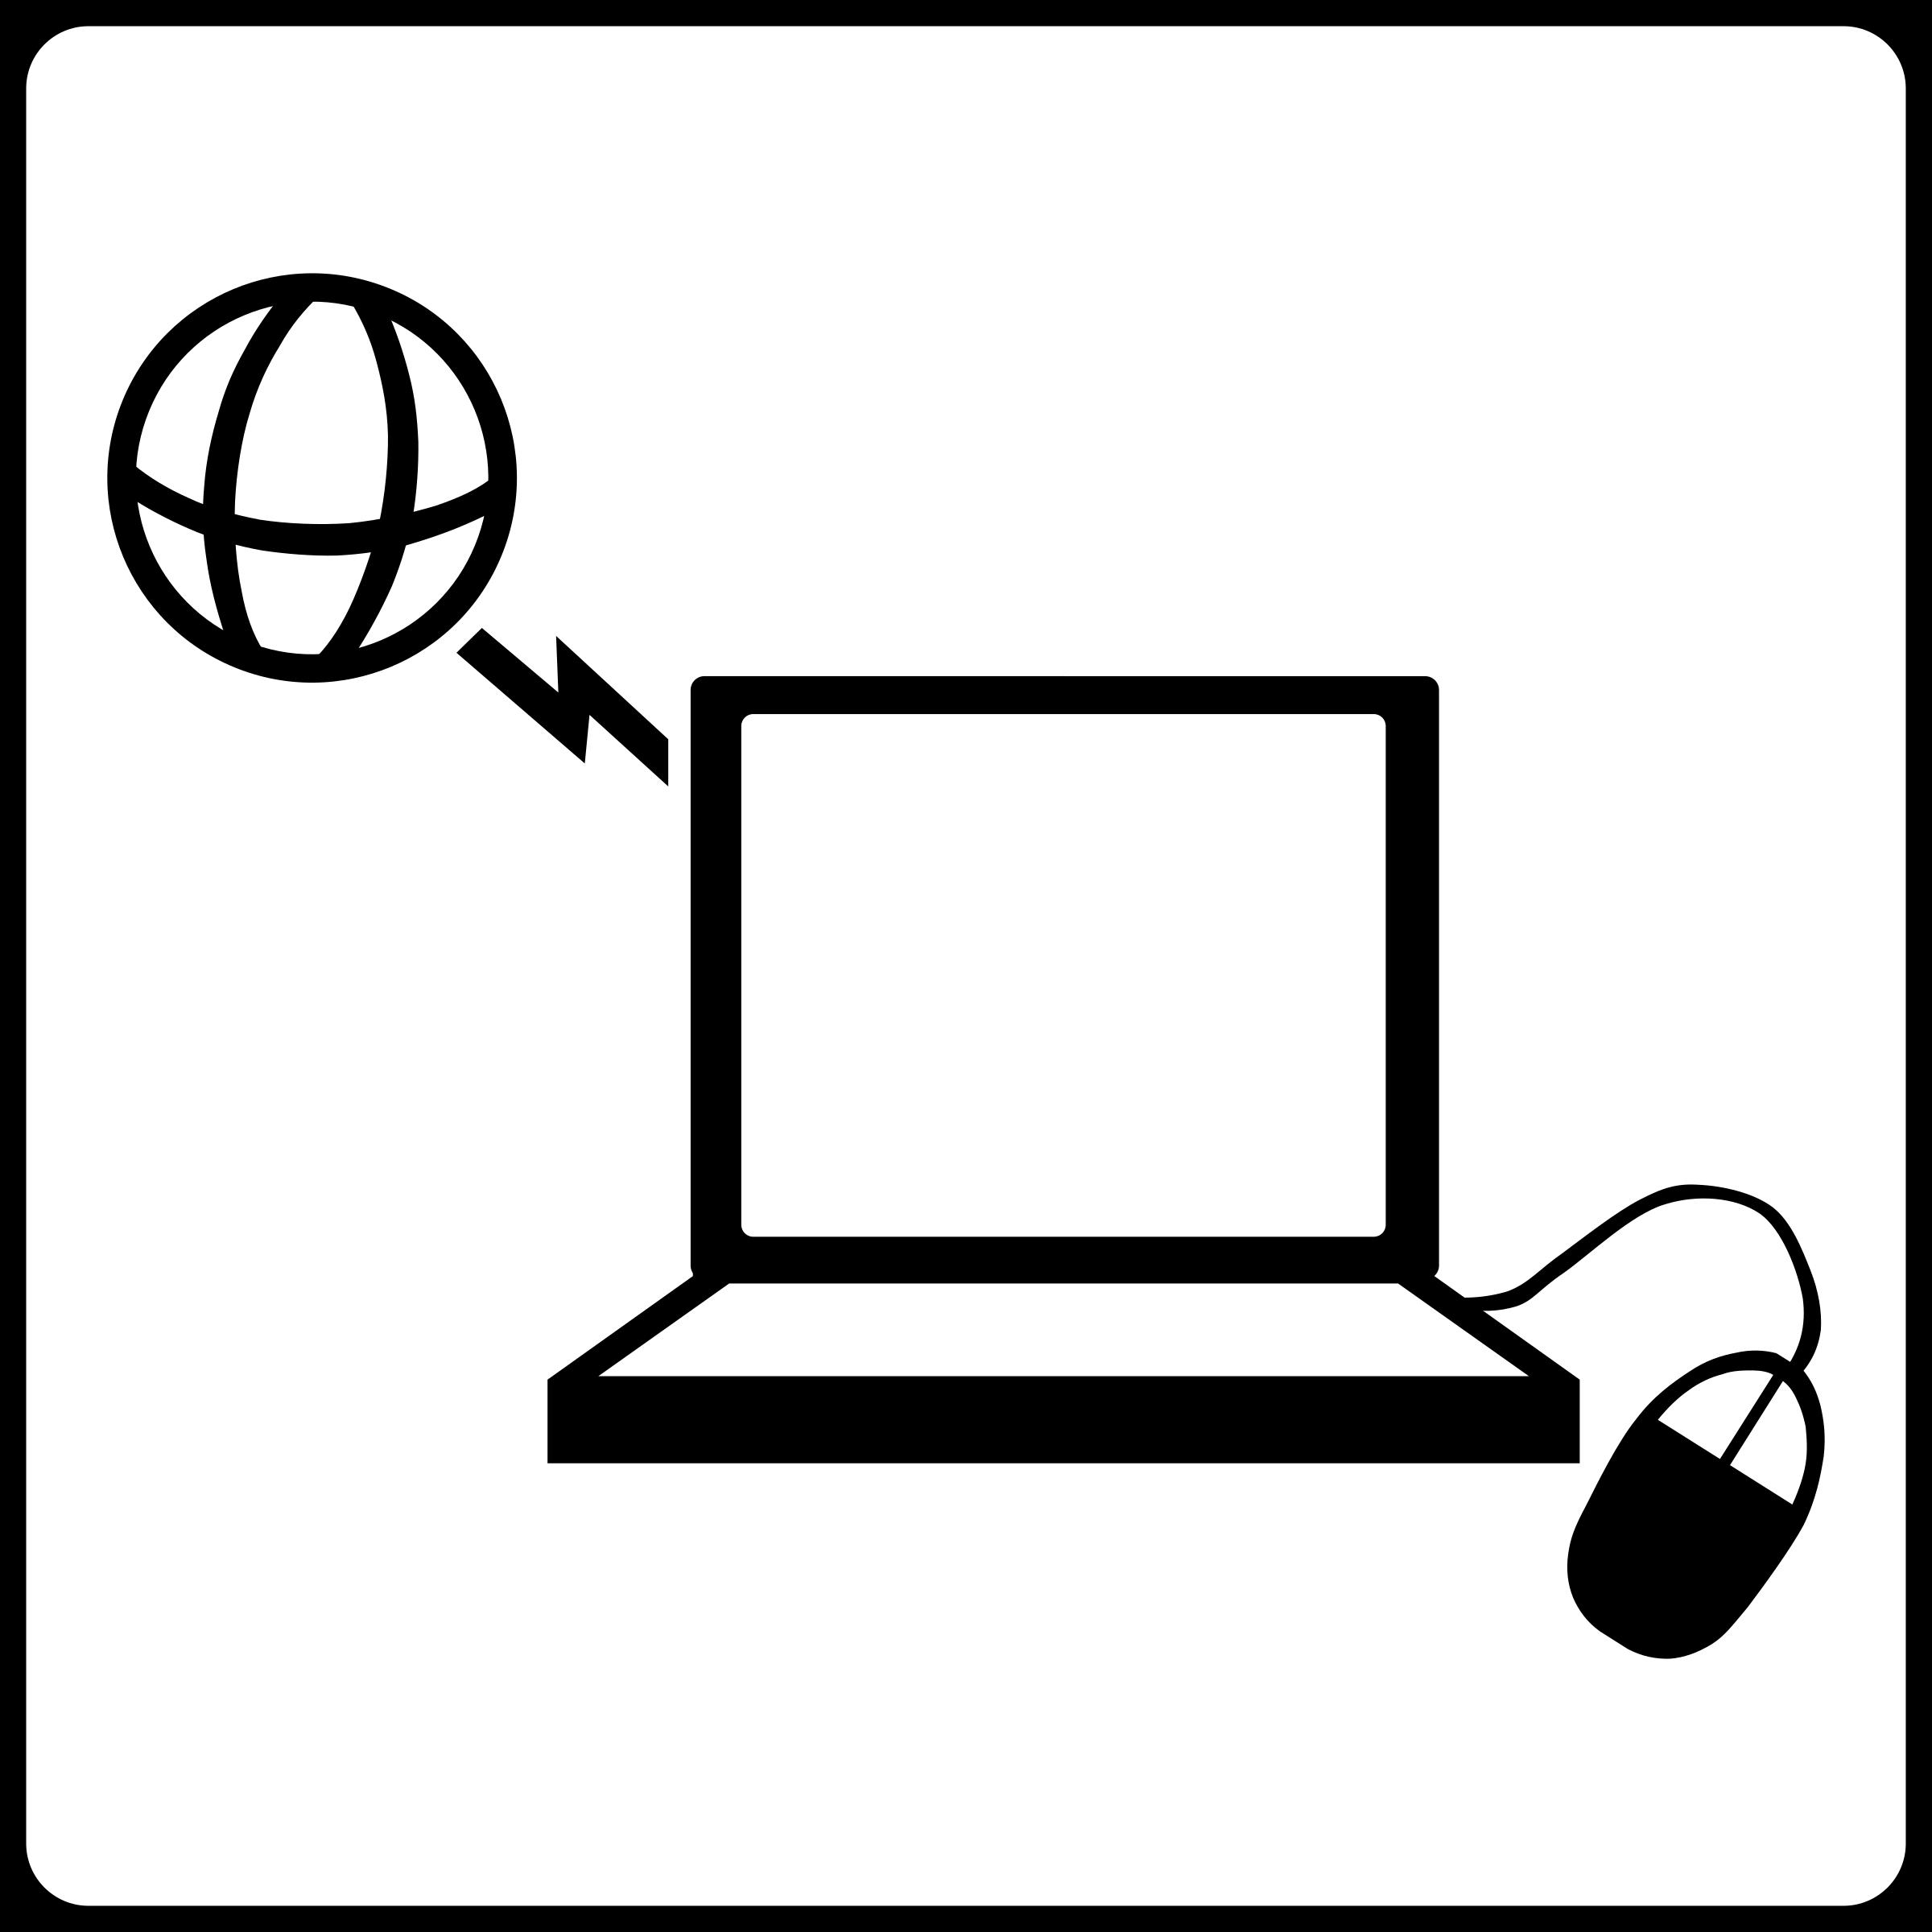 Clipart hotel icon has internet hotel icon has internet biocorpaavc